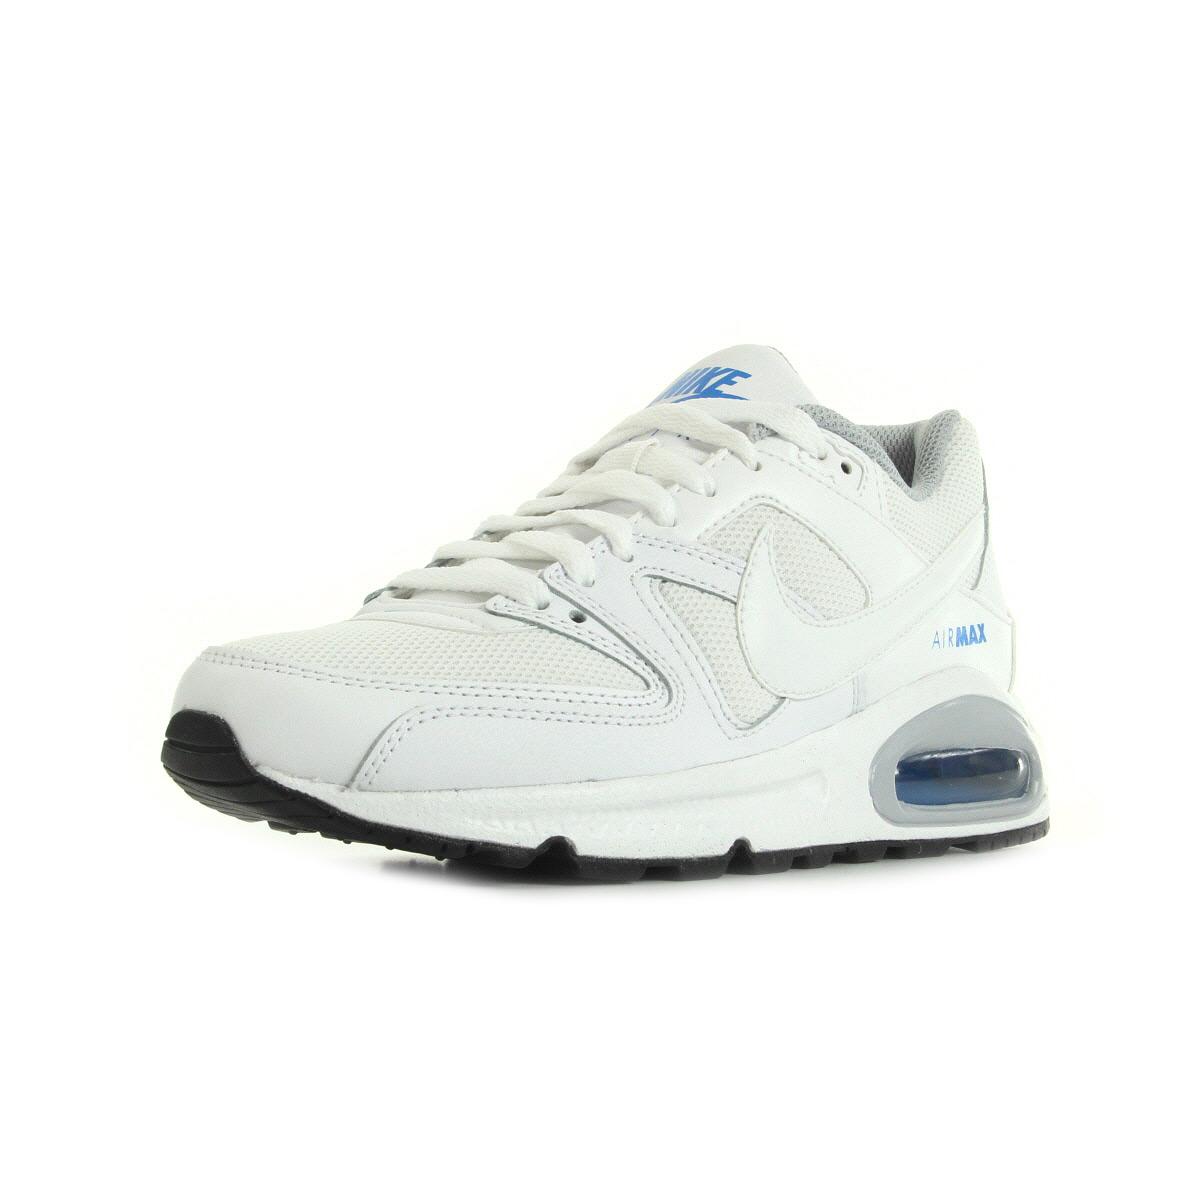 free shipping b28d6 0cb62 Nike Air Max Command (GS) ...